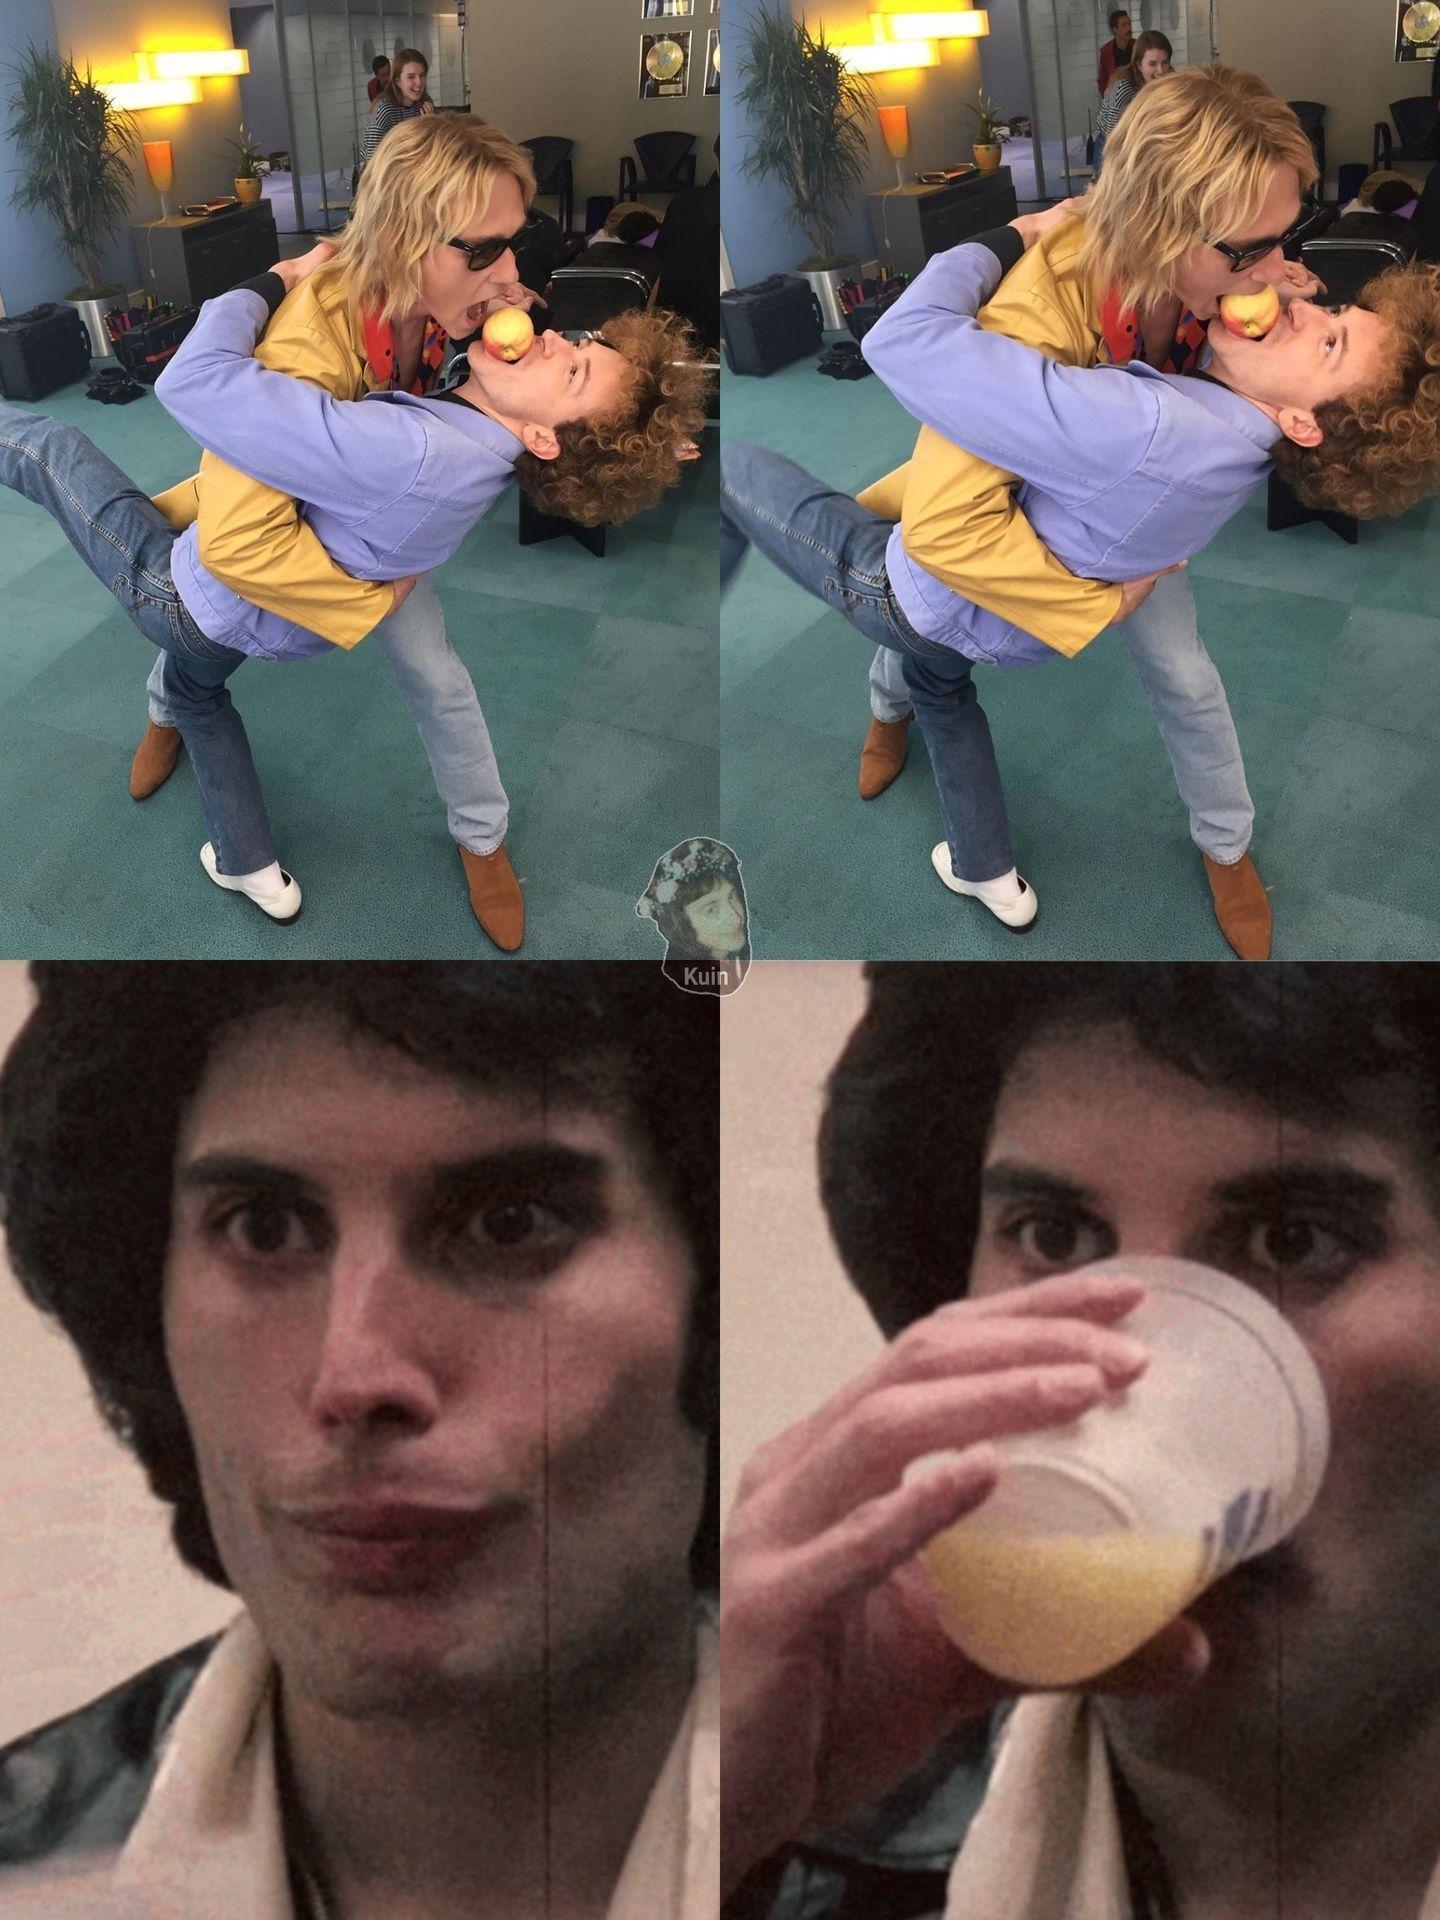 Queen Memes 39 Memes Queen Memes Queen Queen Band